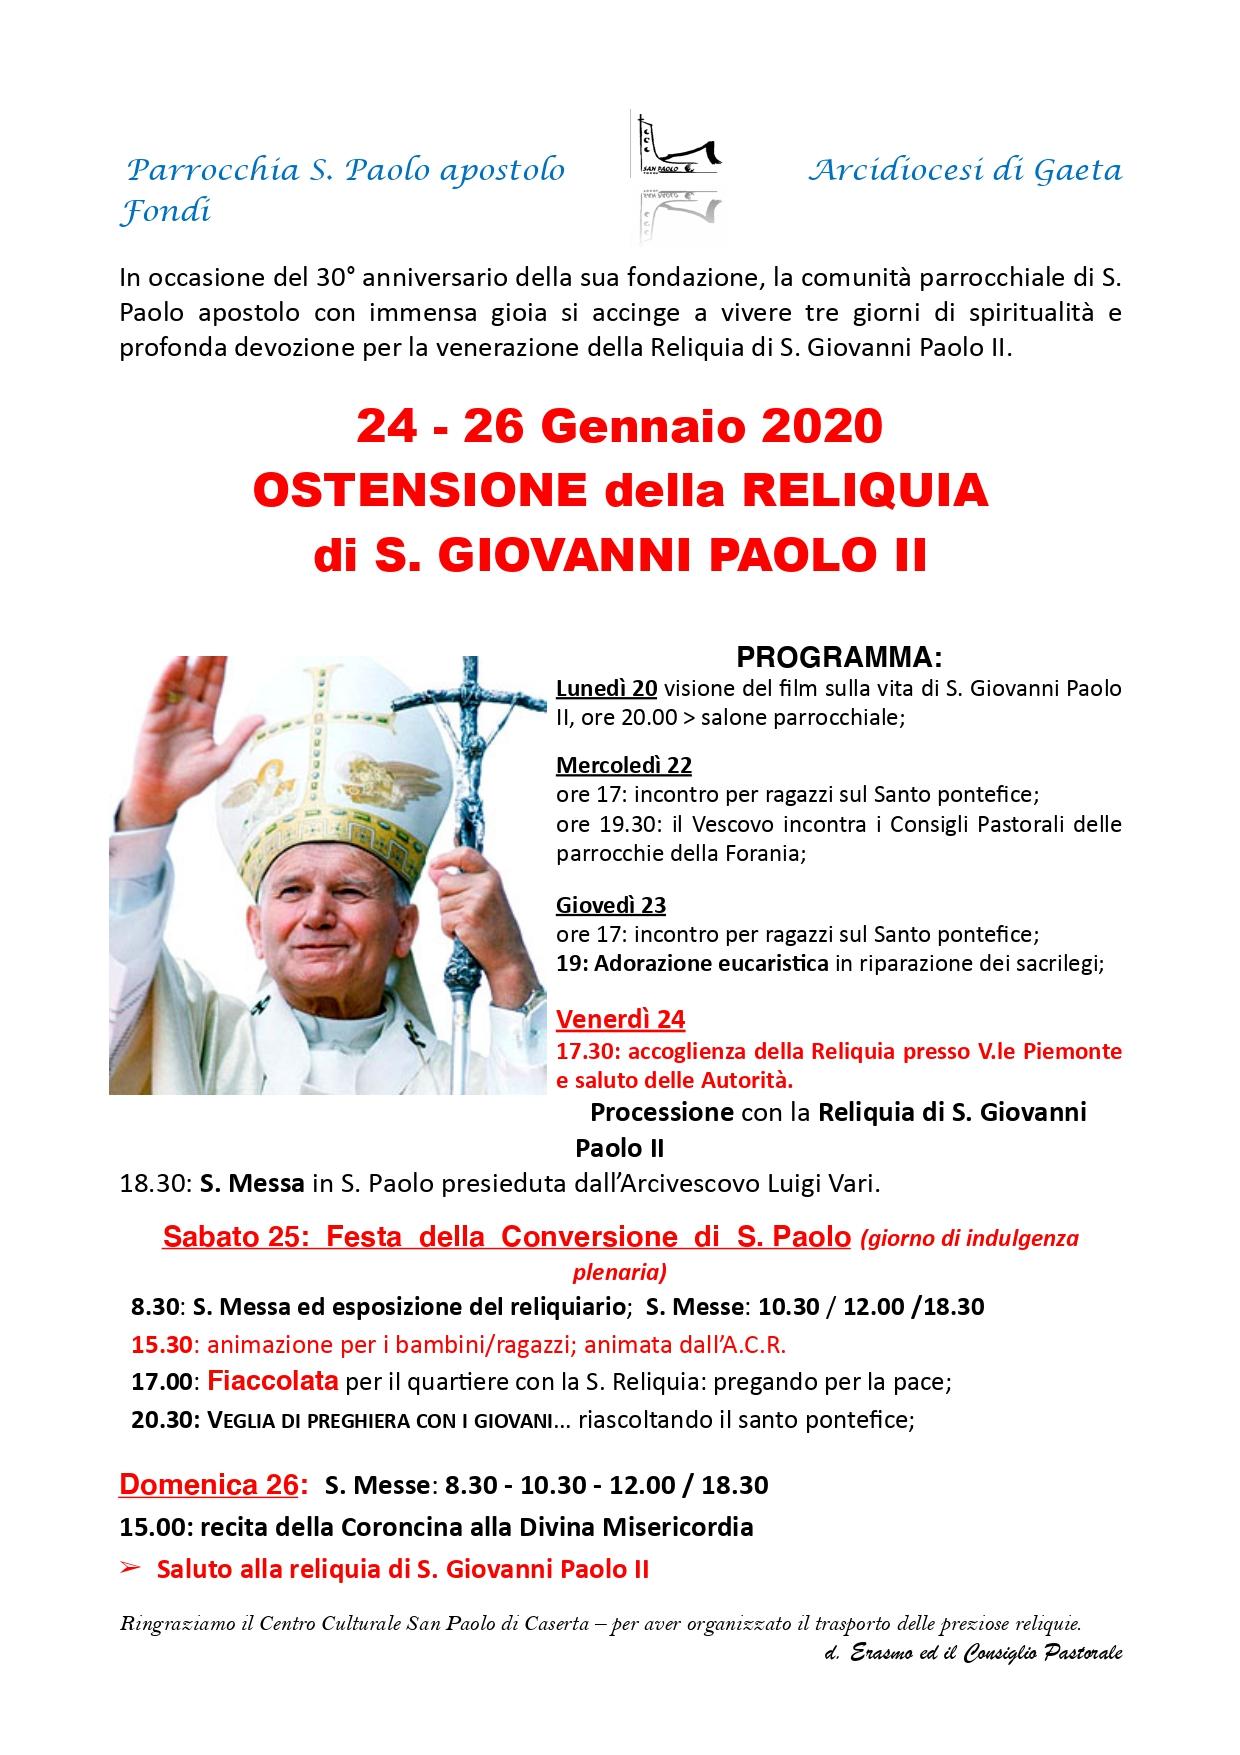 LOCANDINA G.P.II Fondi 24-26 Gennaio 2020 Fondi LT_page-0001.jpg